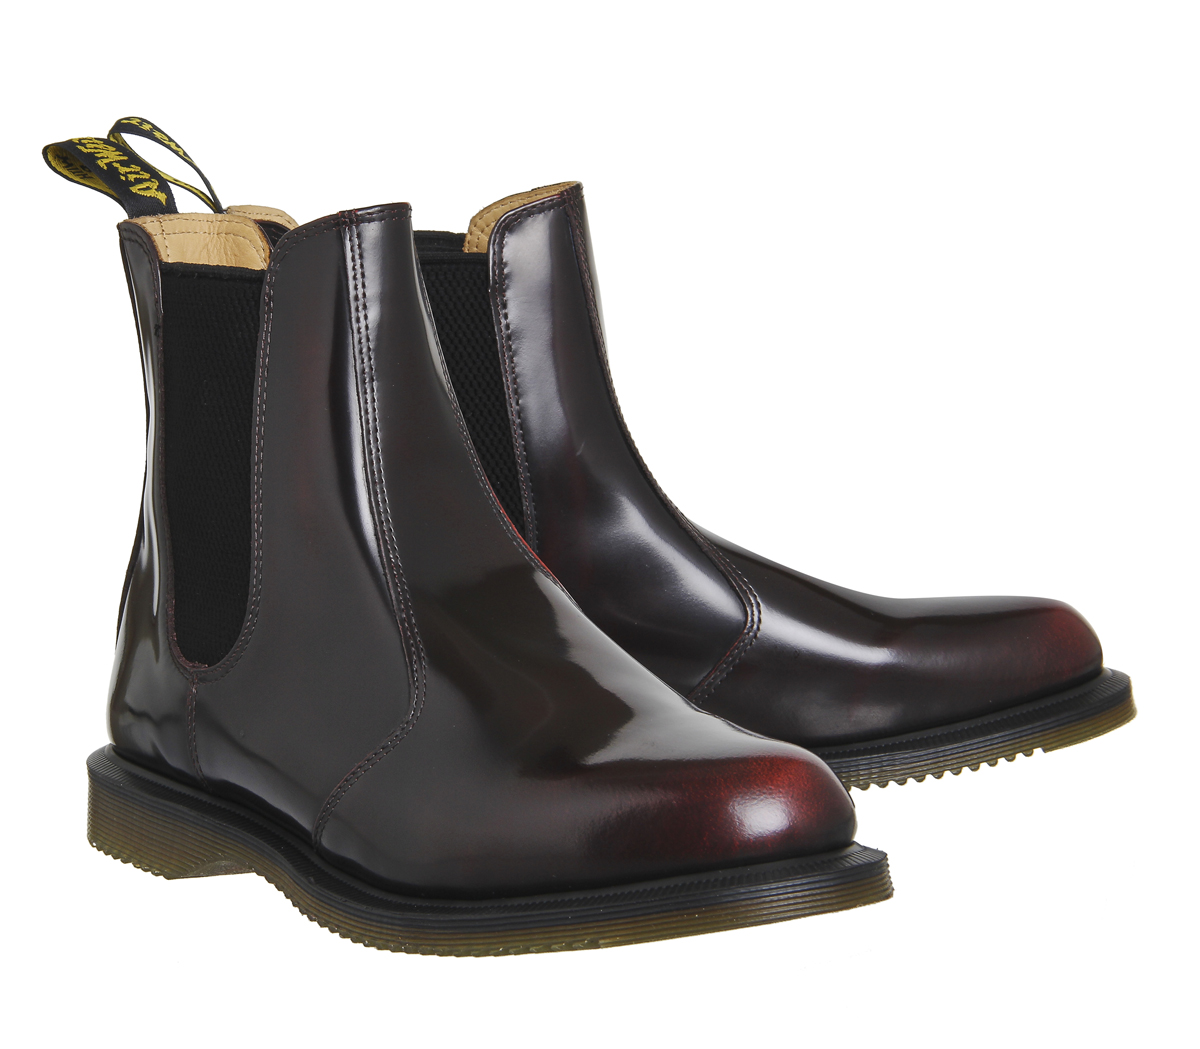 78d972a3cd2f4 Womens Dr. Martens Kensington Flora Boots Burgundy Leather Boots | eBay